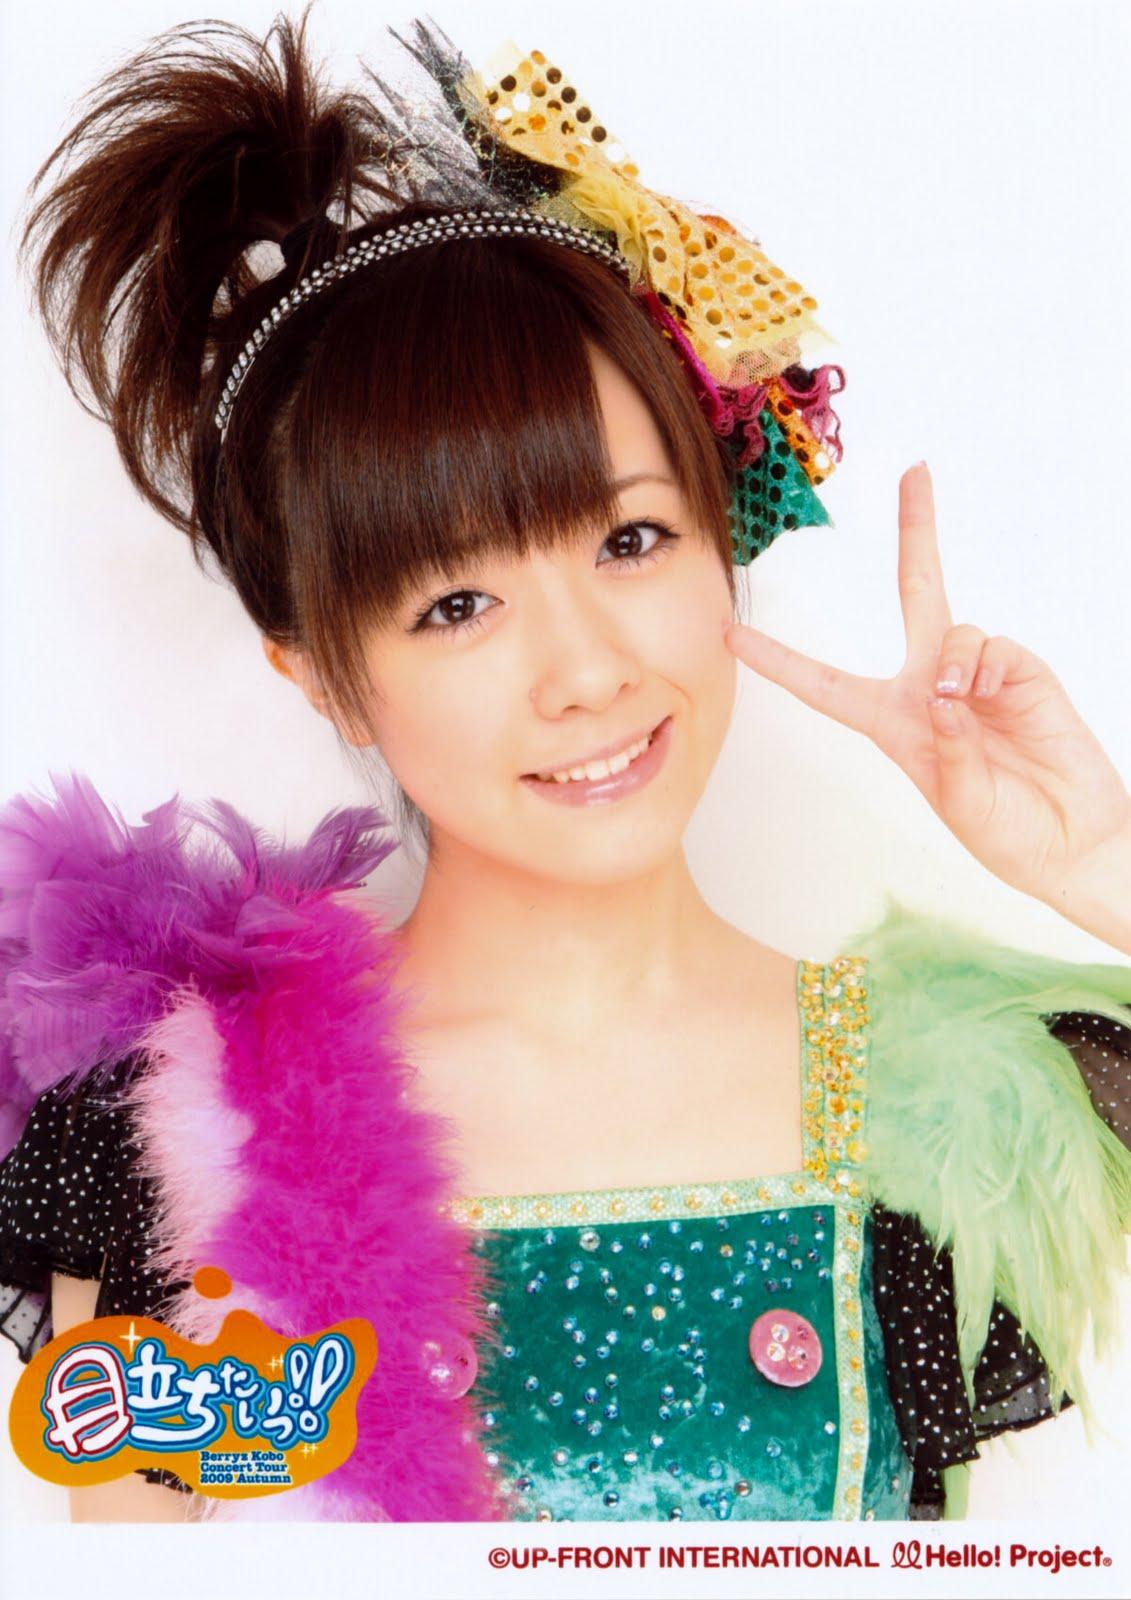 http://4.bp.blogspot.com/_peohFK9jjNE/SwZmPrChdpI/AAAAAAAAAOs/Gw2NhDliy1o/s1600/ShimizuSaki%E2%99%A5+(111).jpg